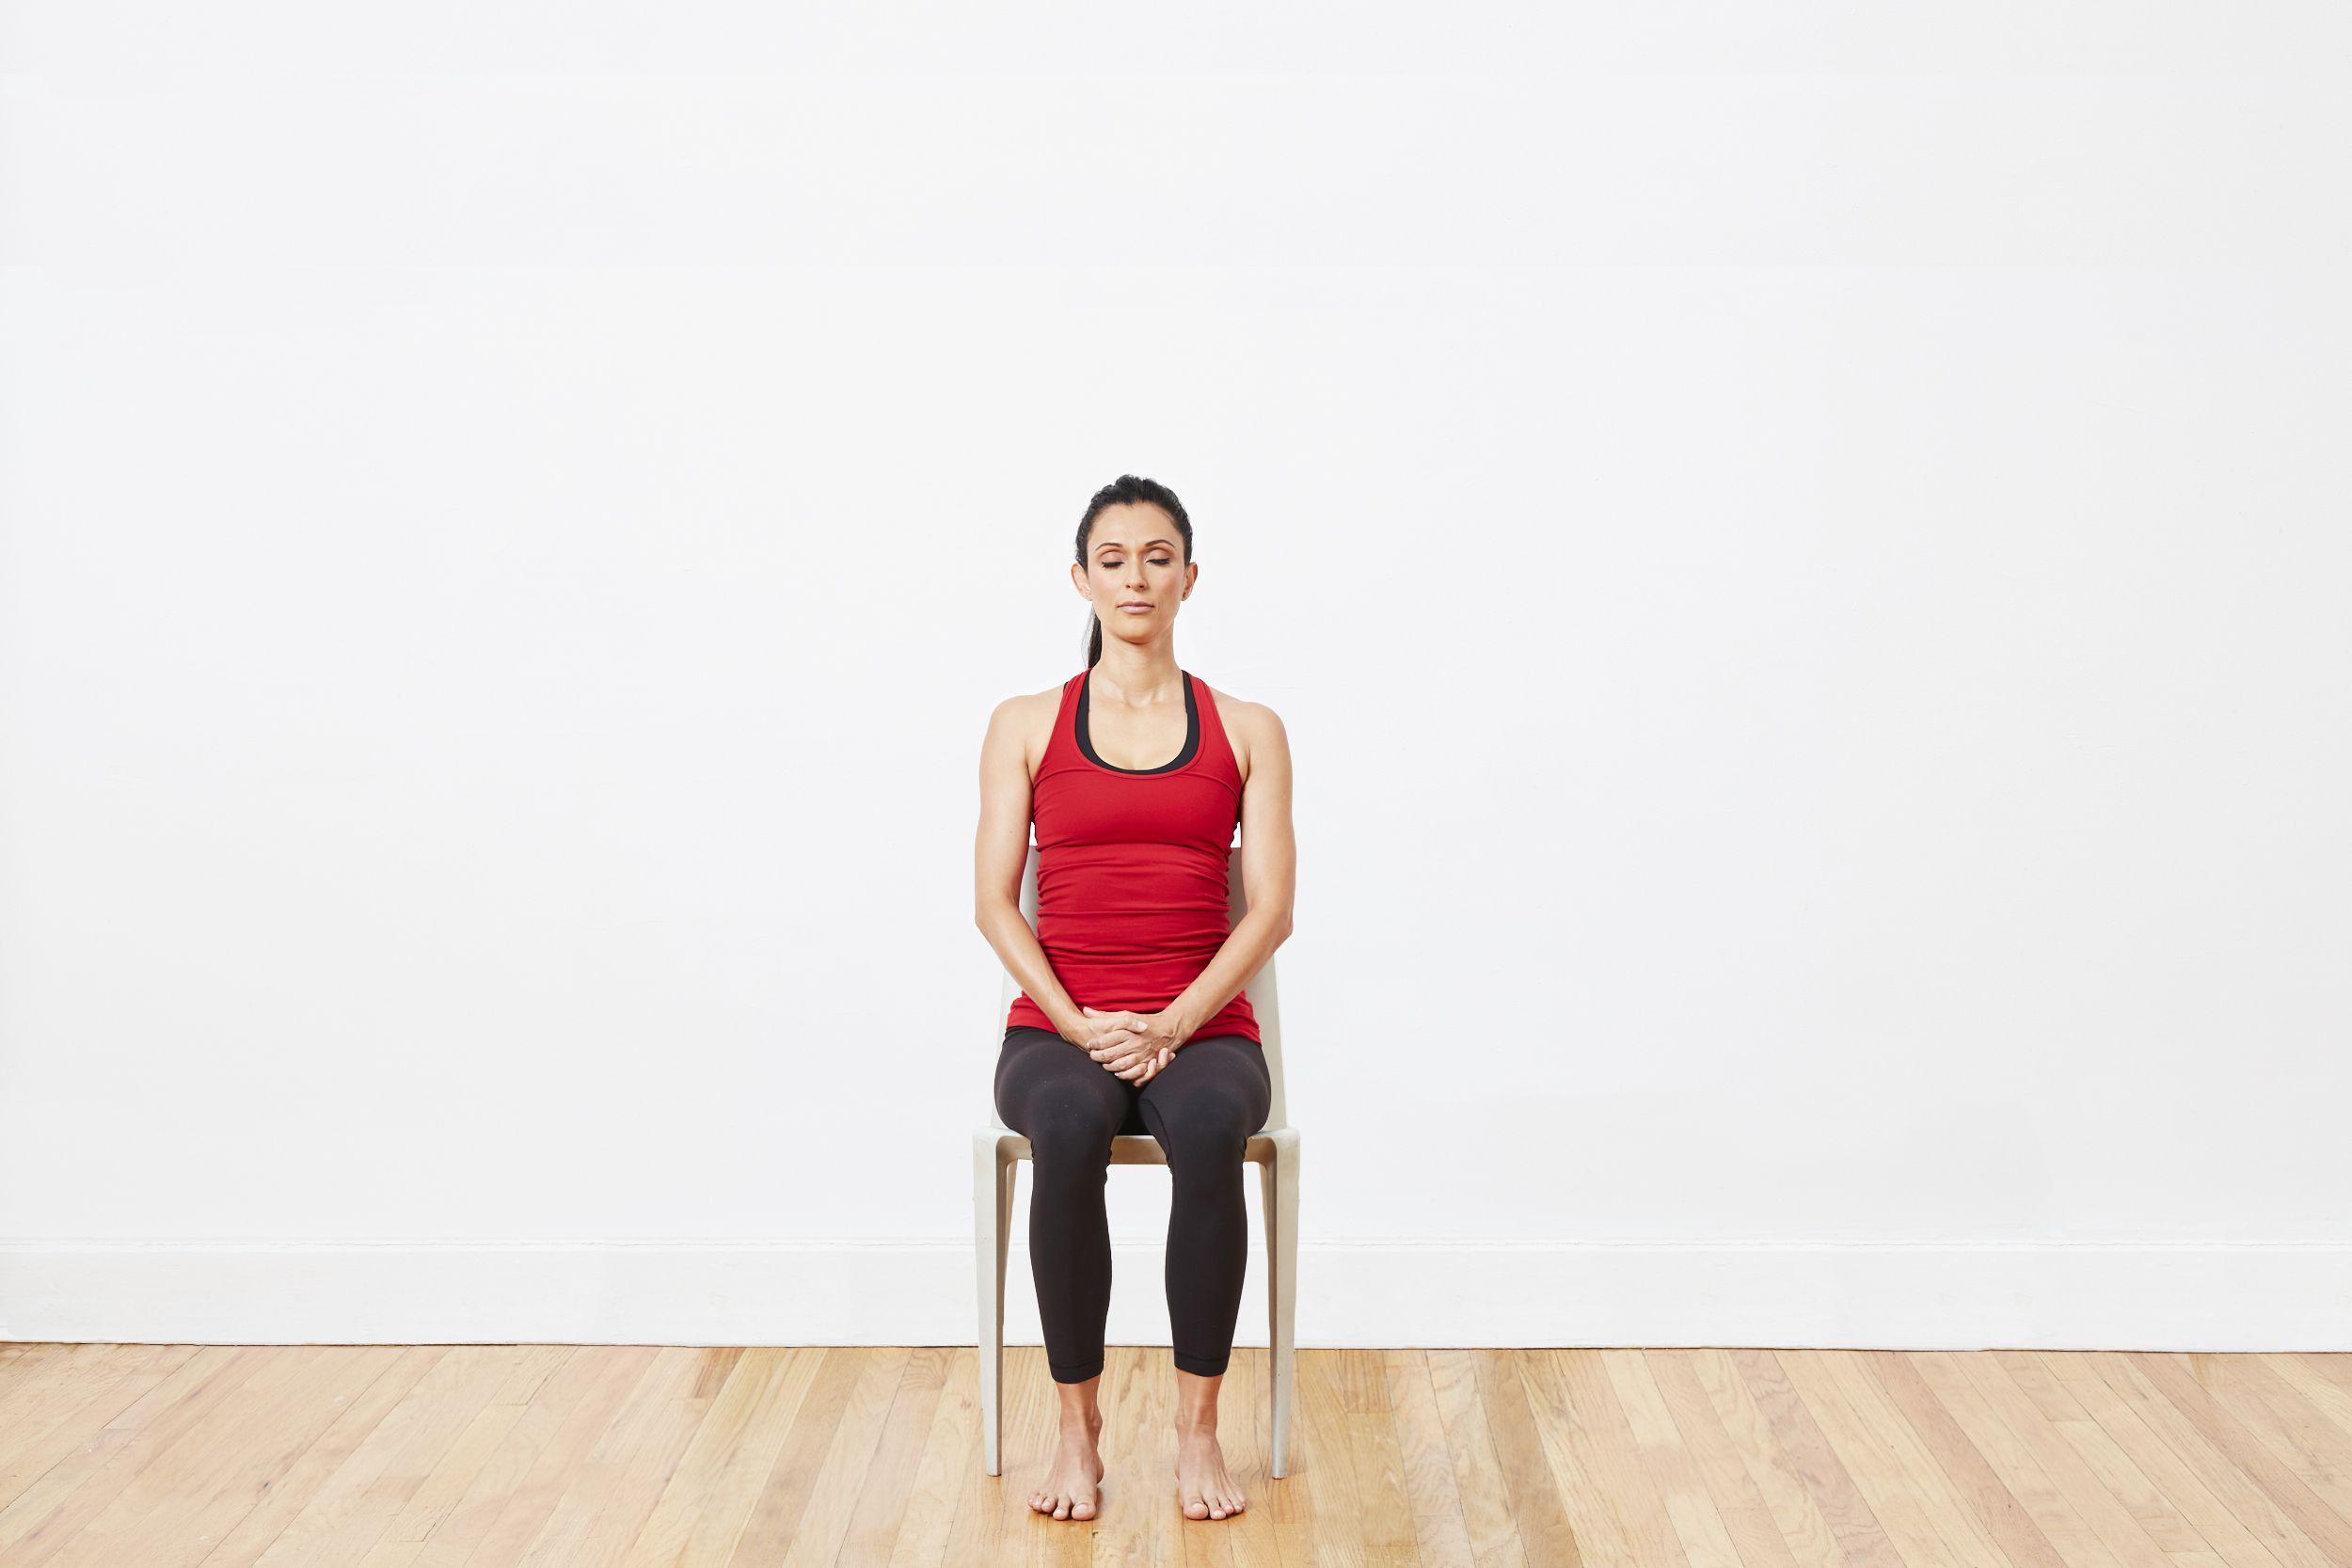 Joga Ofis Yoga Poses For Men Yoga Poses Yoga Steps